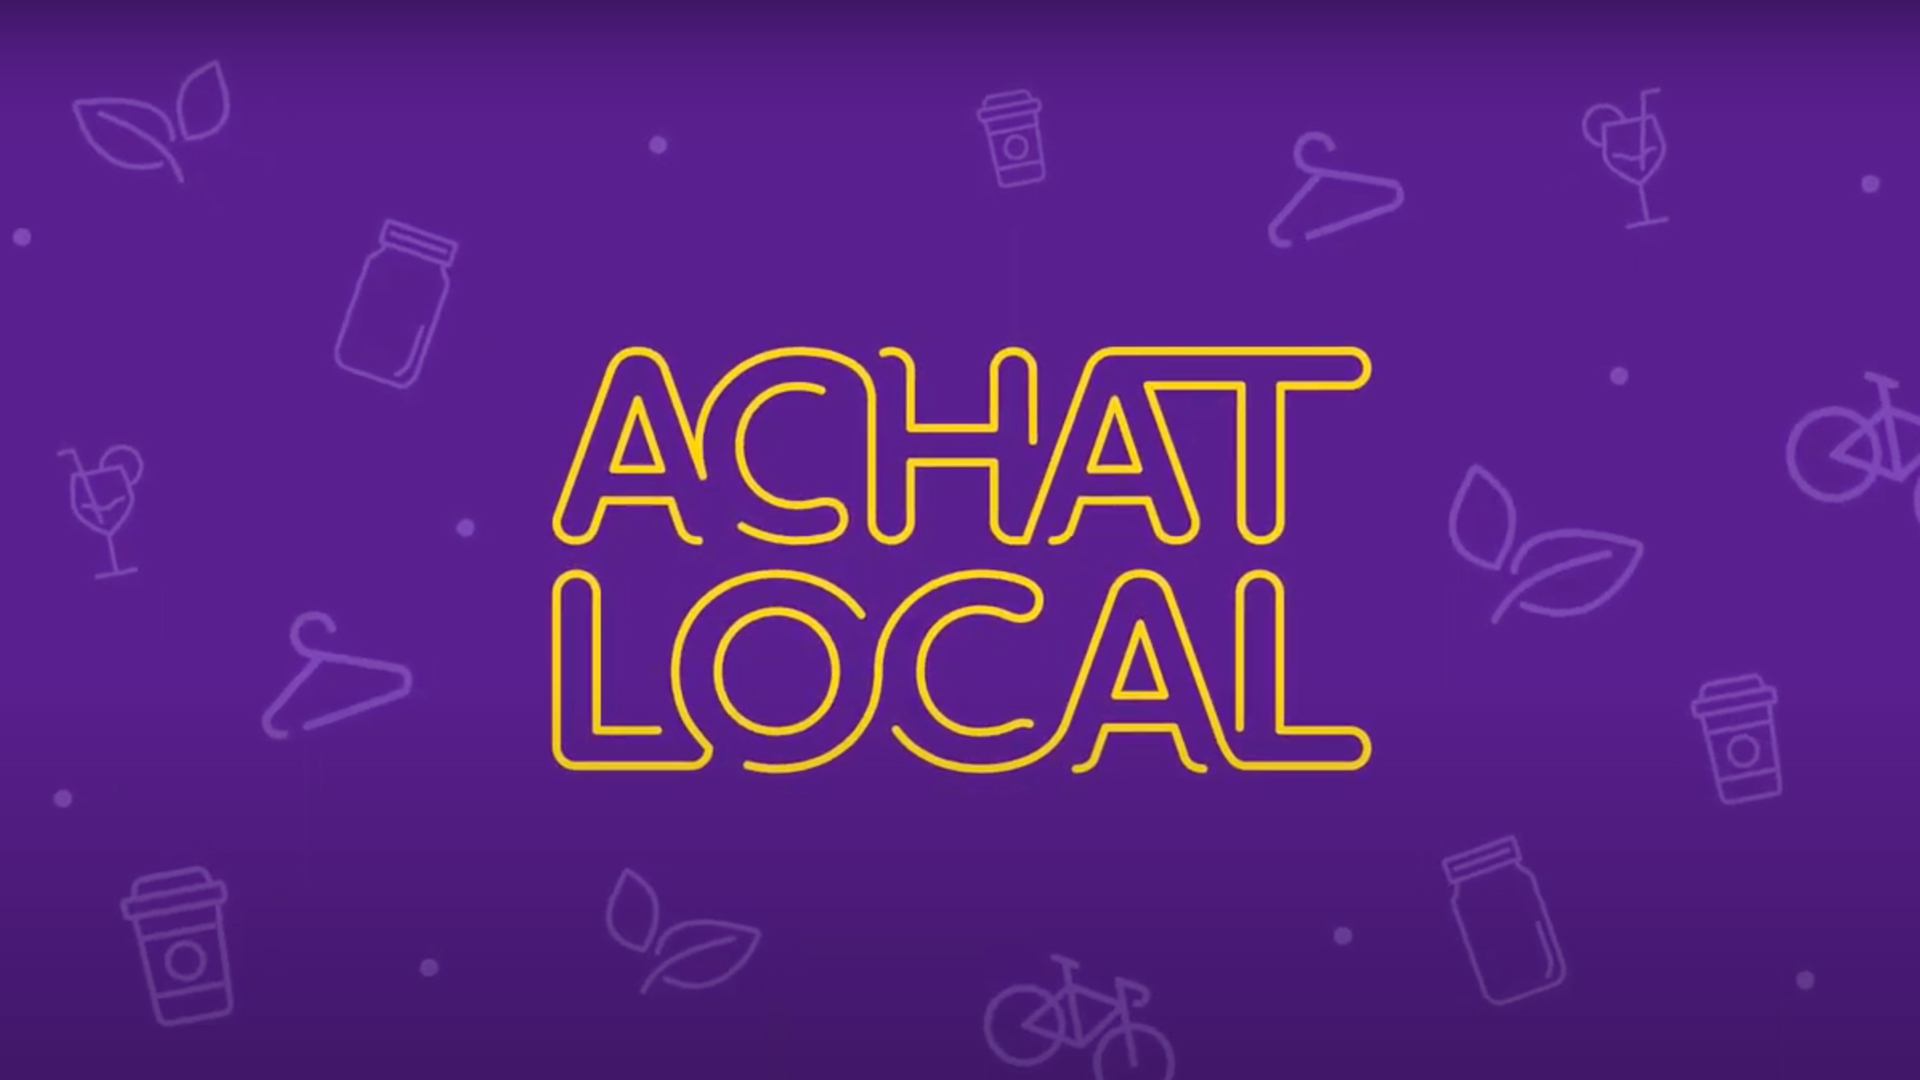 achat-local